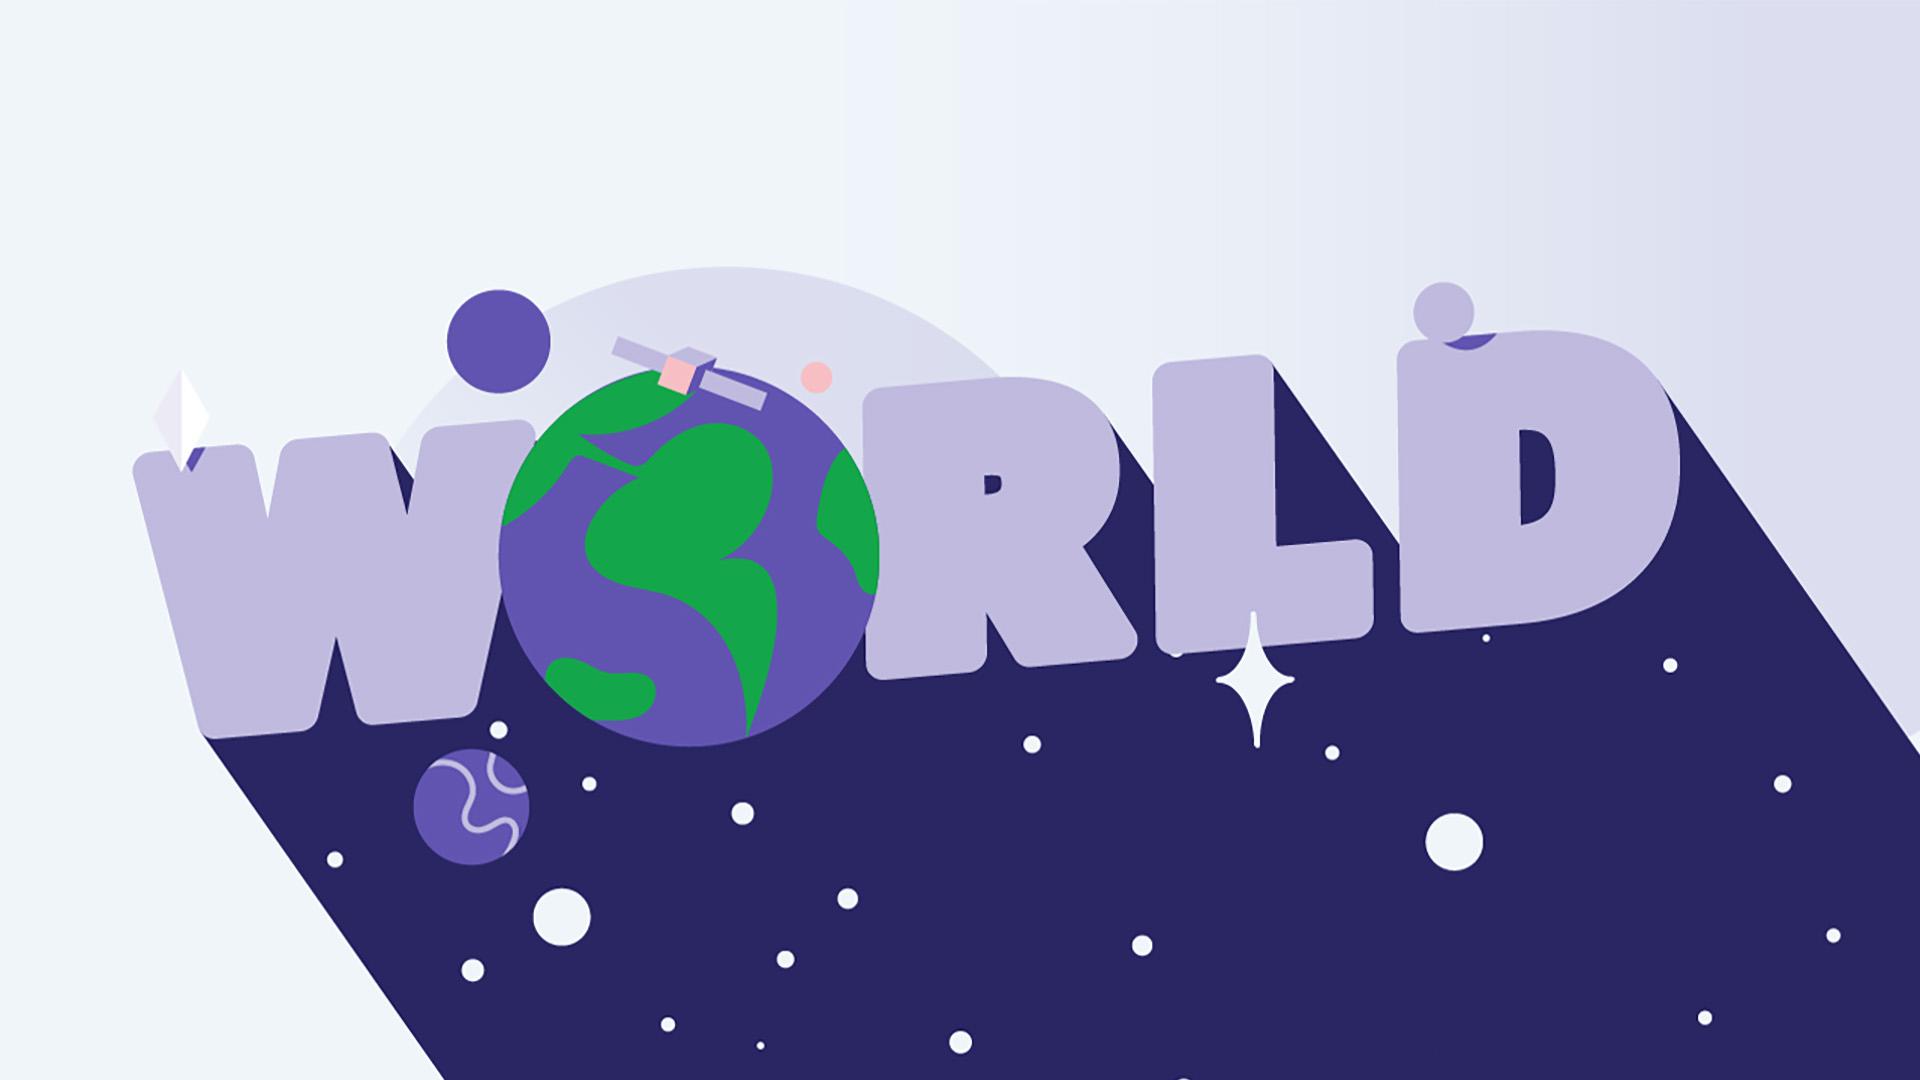 roofstudio_juni-learning_world-02-4